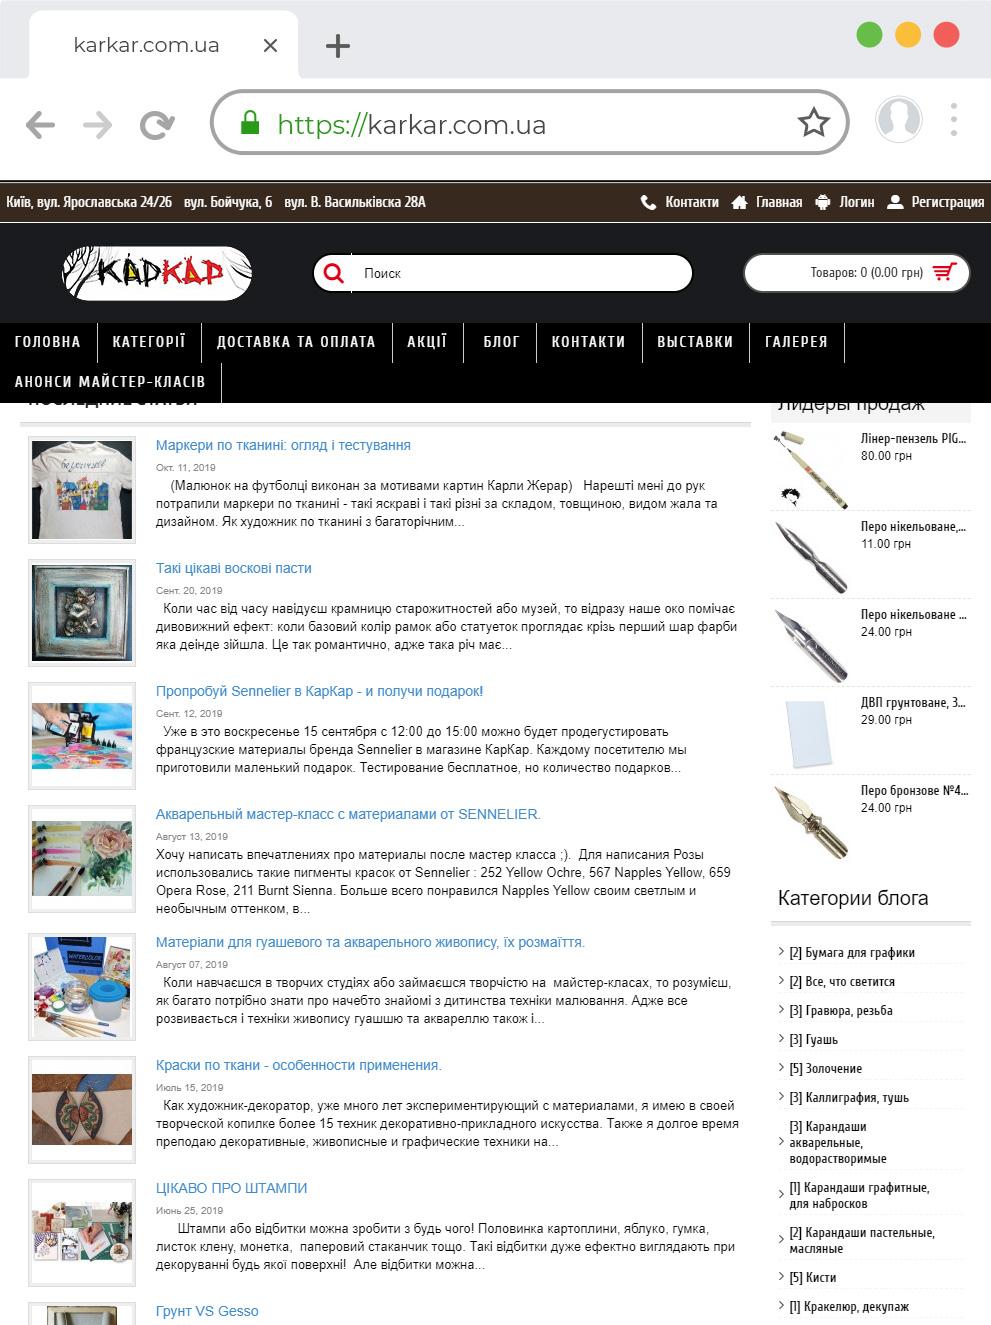 SEO оптимизация сайта karkar.com.ua